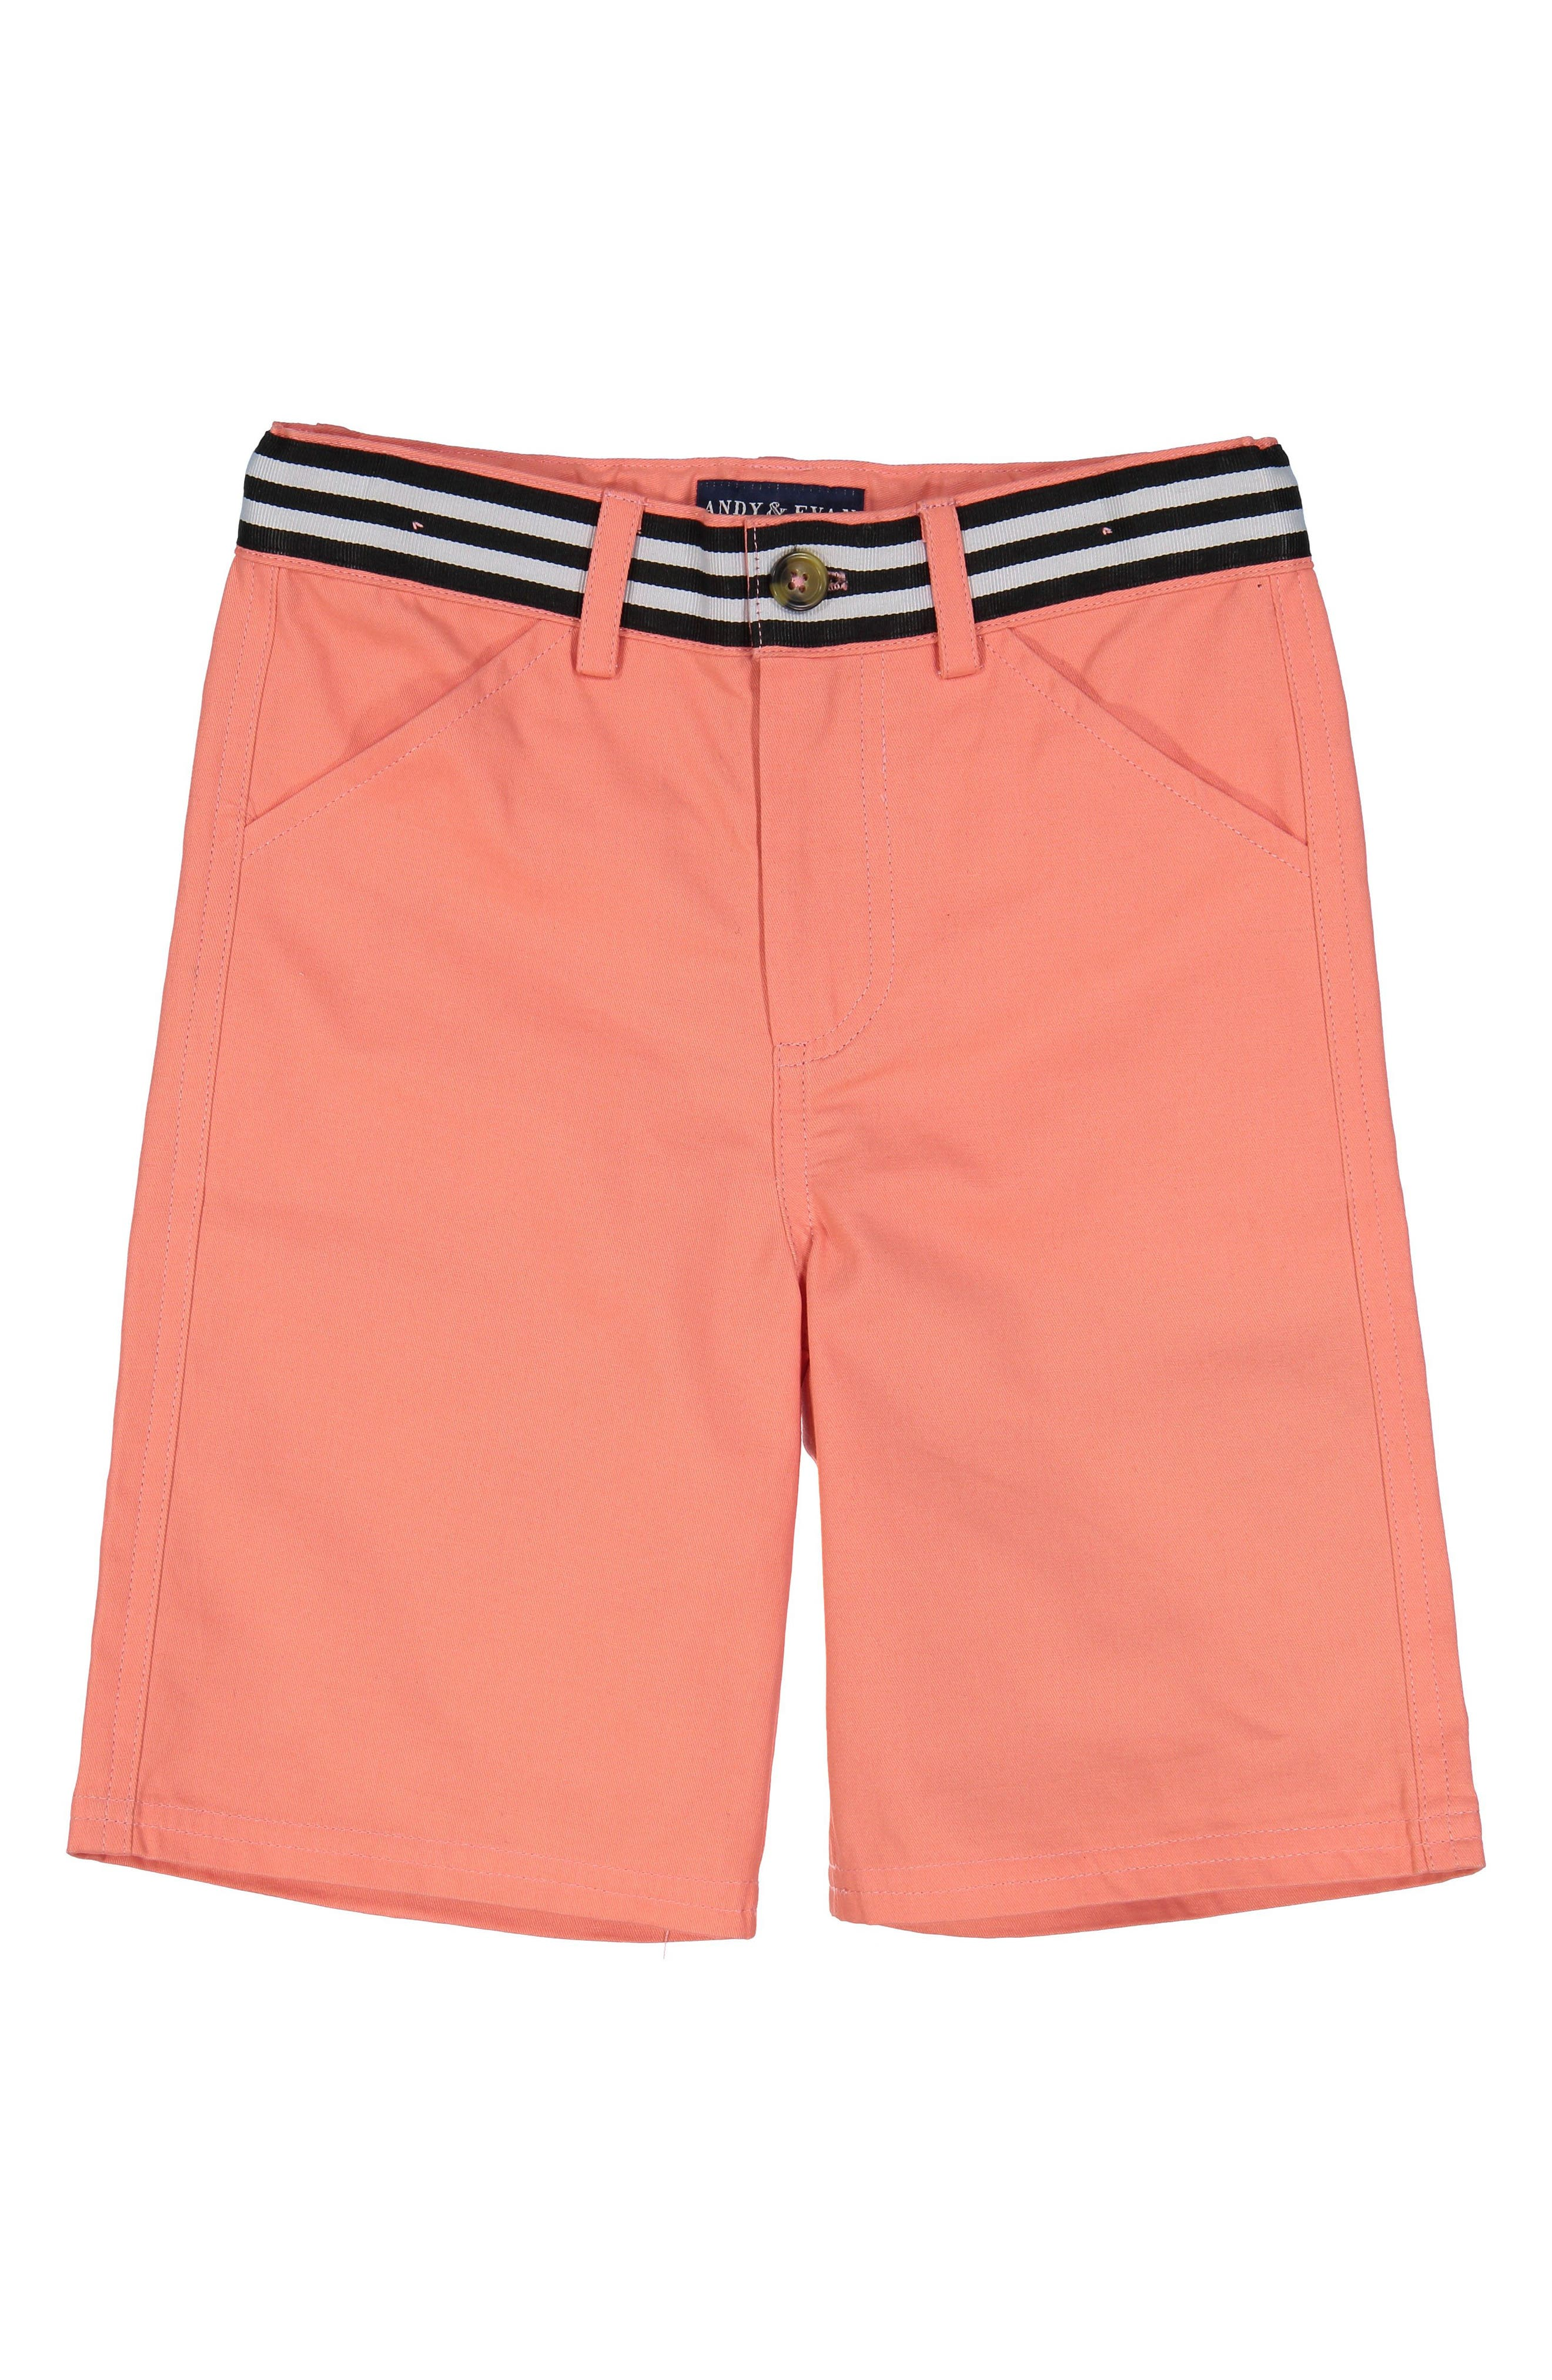 Andy & Evan Stretch Cotton Shorts (Toddler Boys & Little Boys)